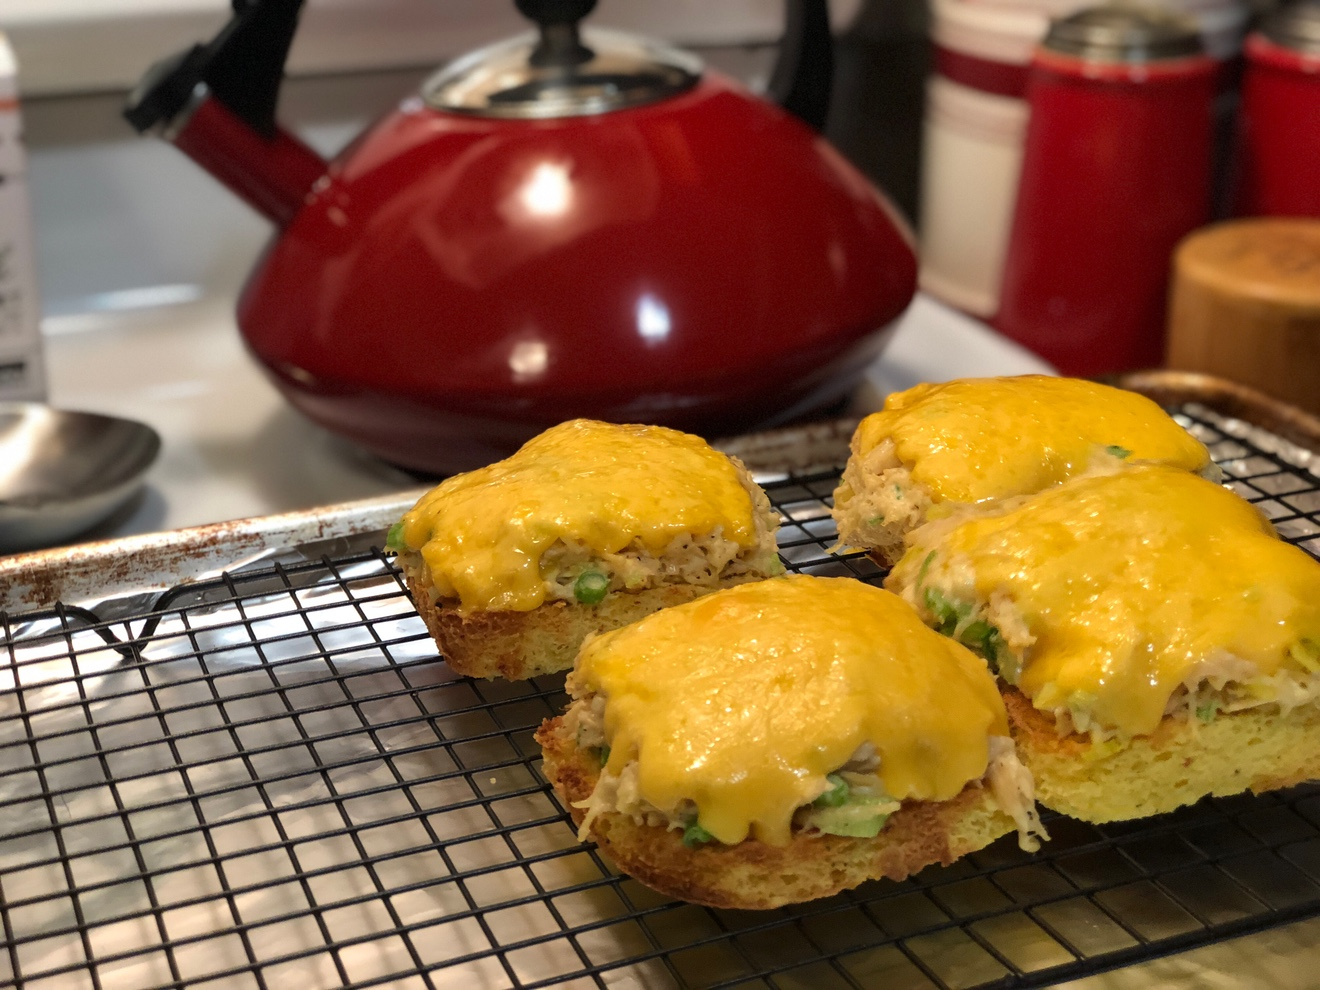 90 Second Bread Chicken Melt Keto Friendly Delicious Versatile Cjsketokitchen Com